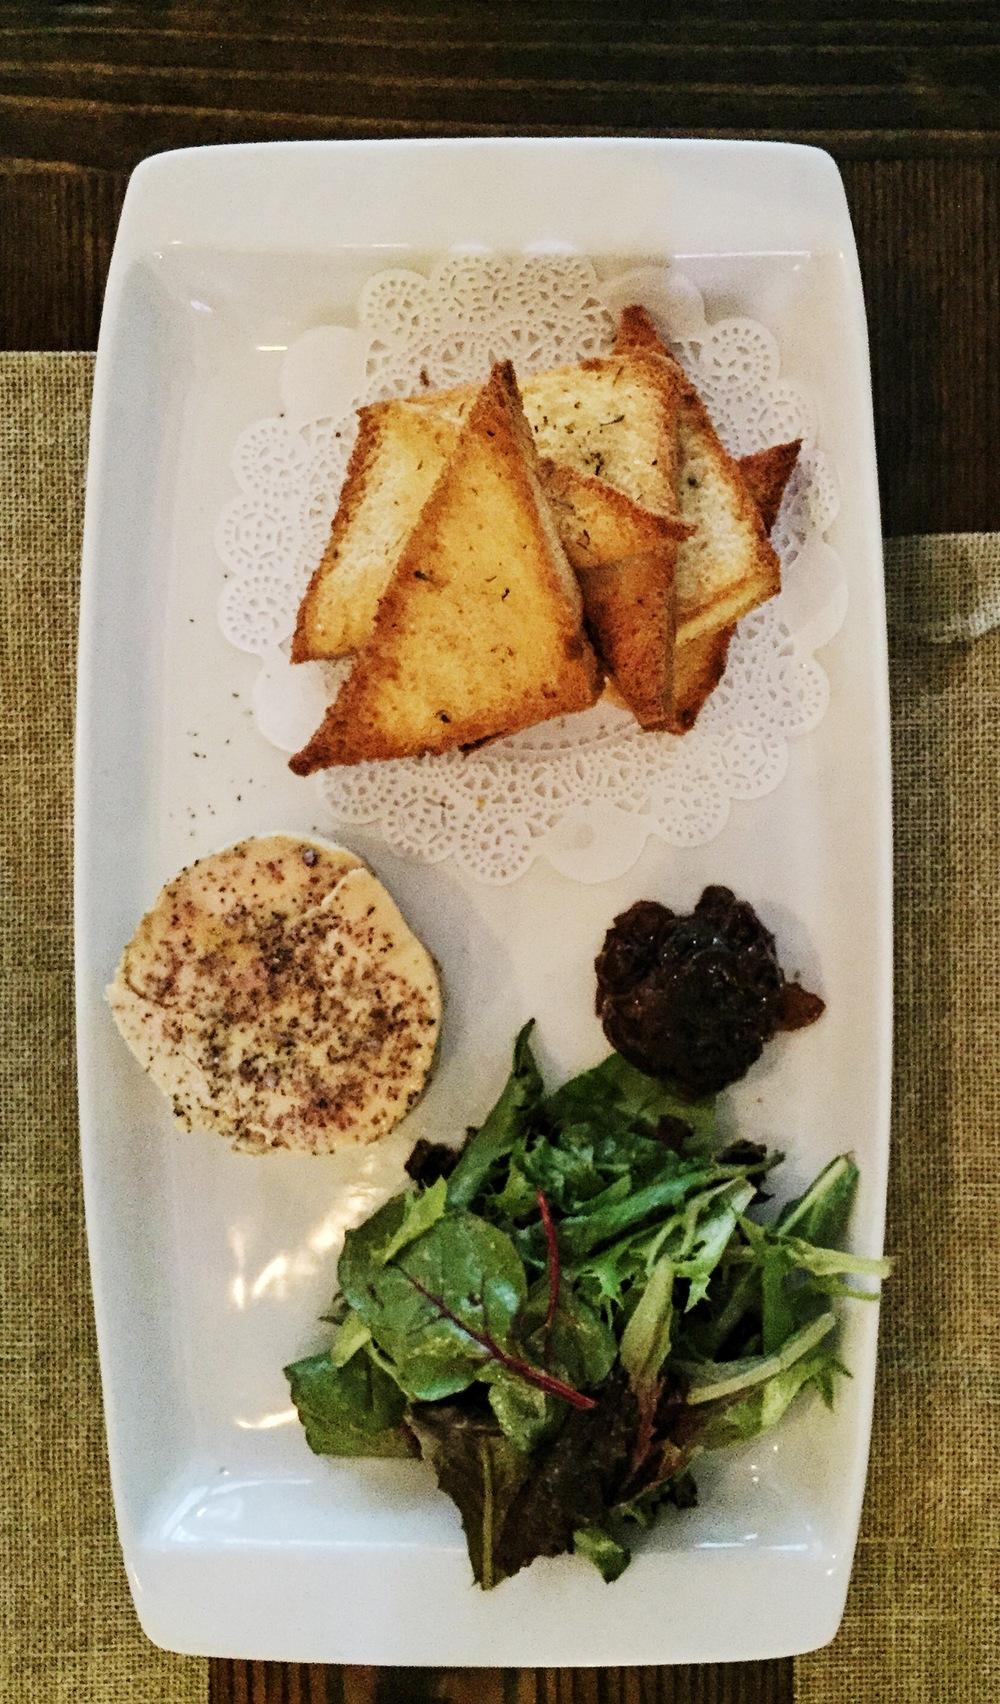 Foie Gras Maison – homemade duck fois gras, onion jam, toasted brioche